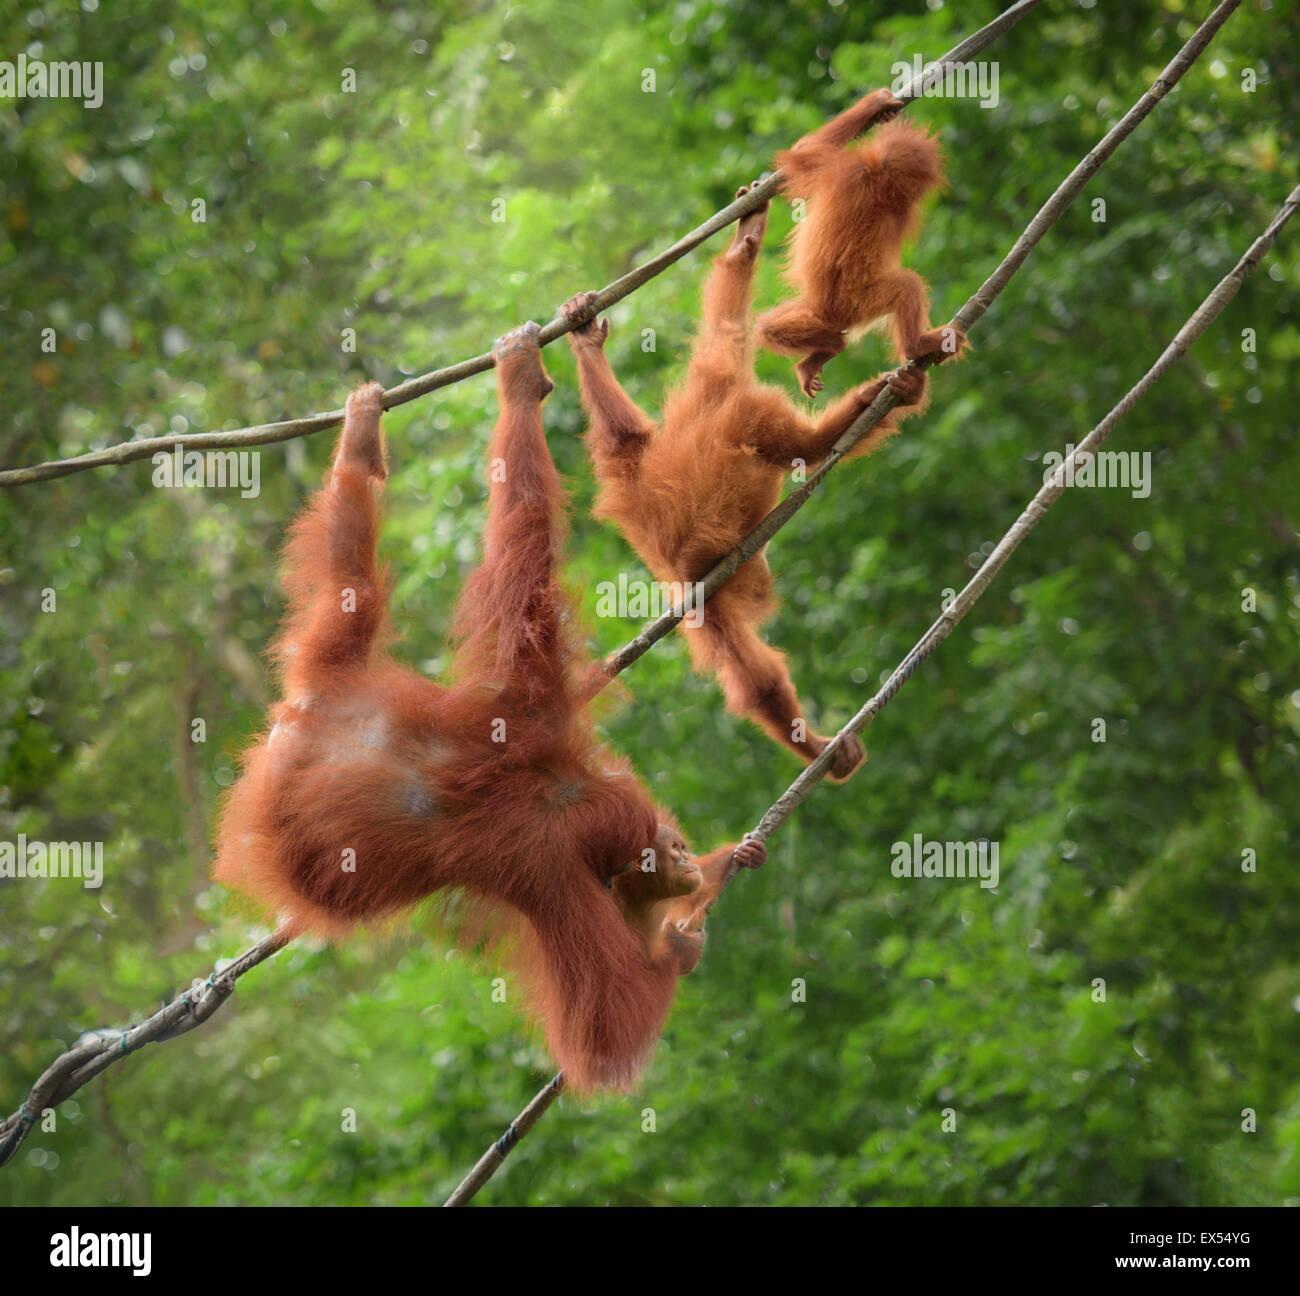 Orangutan family in funny poses walking on liana in a jungle - Stock Image